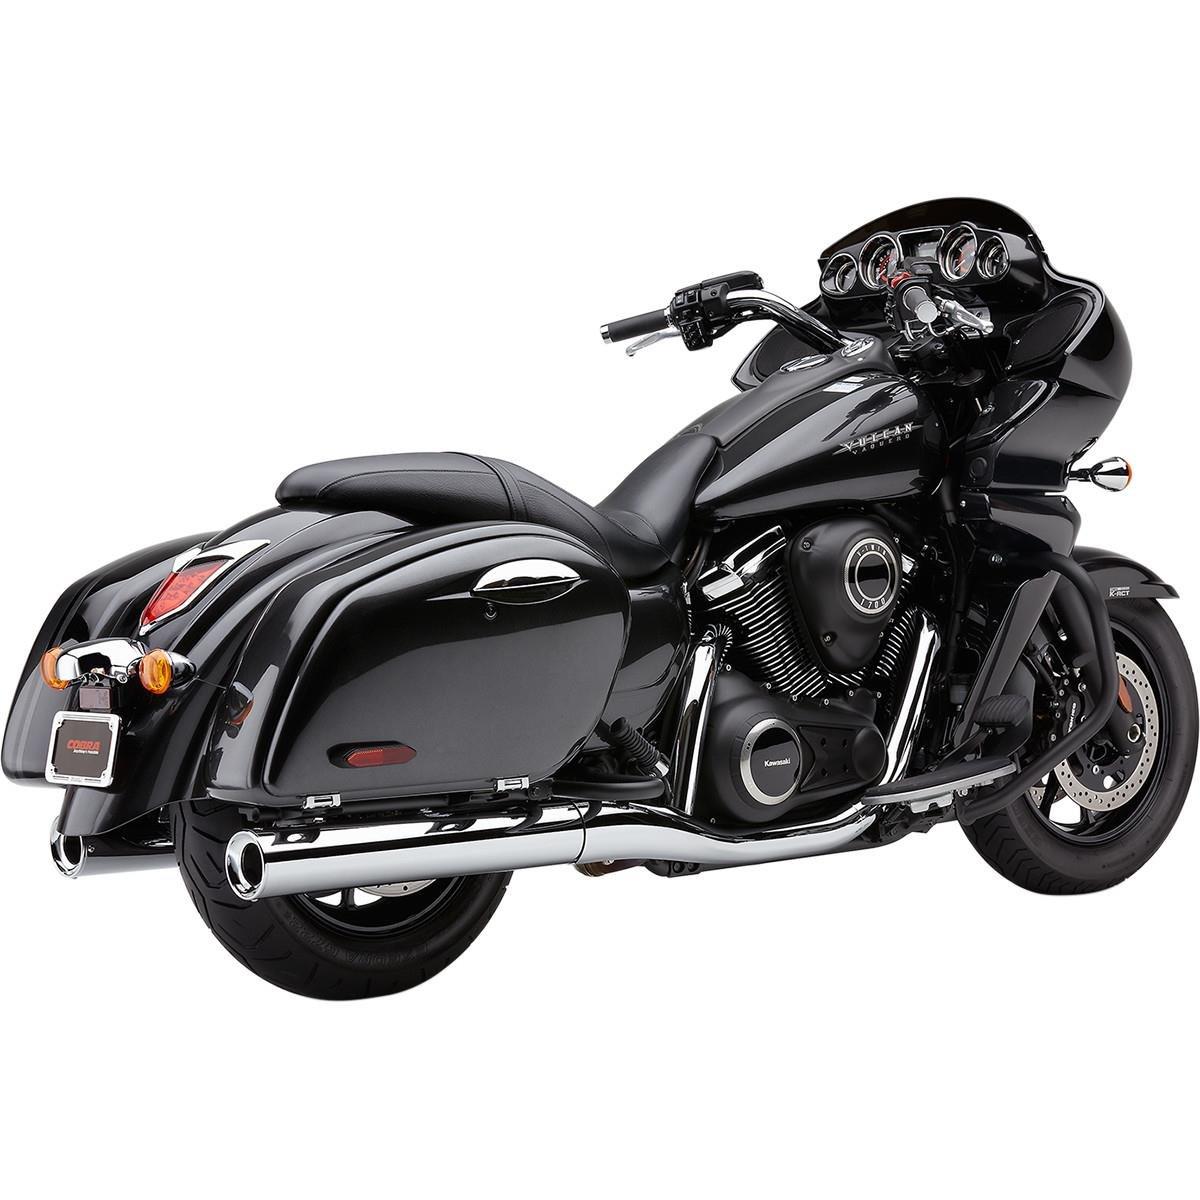 09-13 KAWASAKI VN1700A Chrome // 4 Cobra Billet Tips Slip-On Exhaust